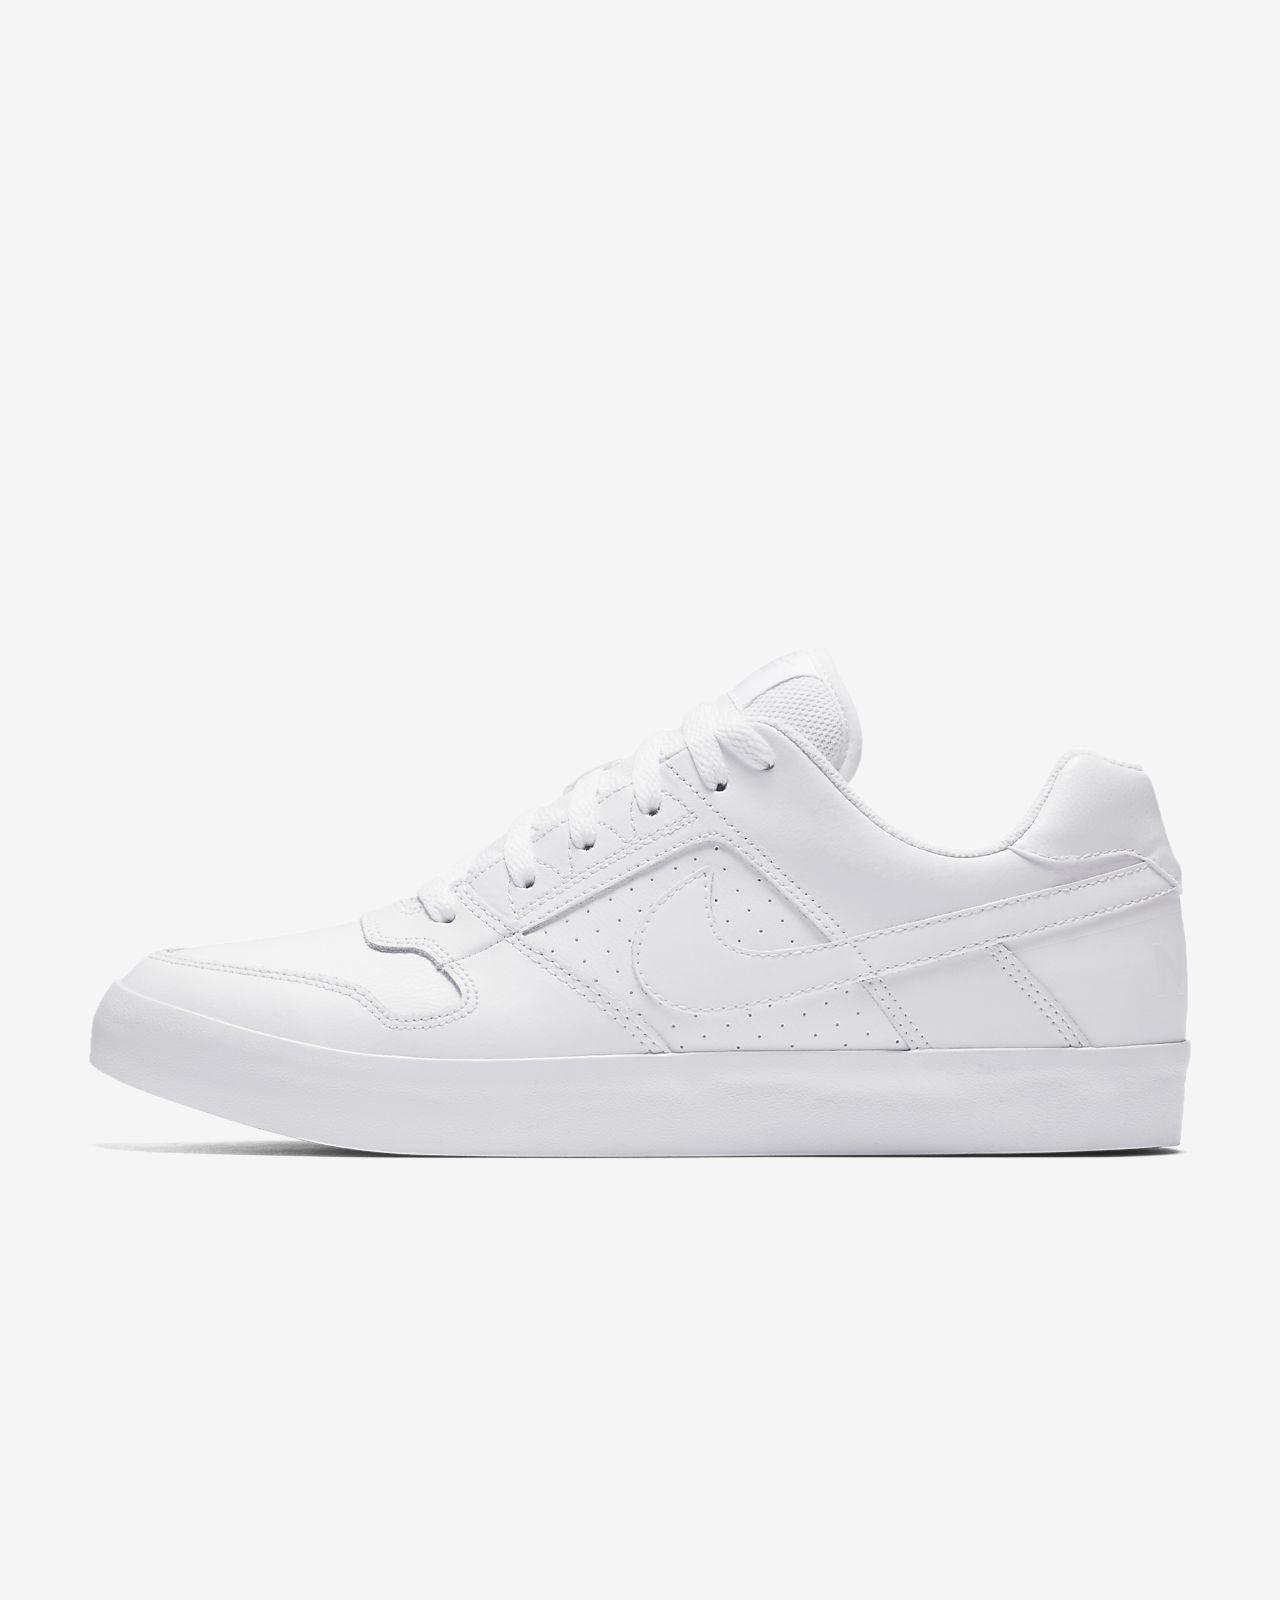 Nike SB Zoom Delta Force Vulc Men's Skate Shoes, UK 8 Anthracite